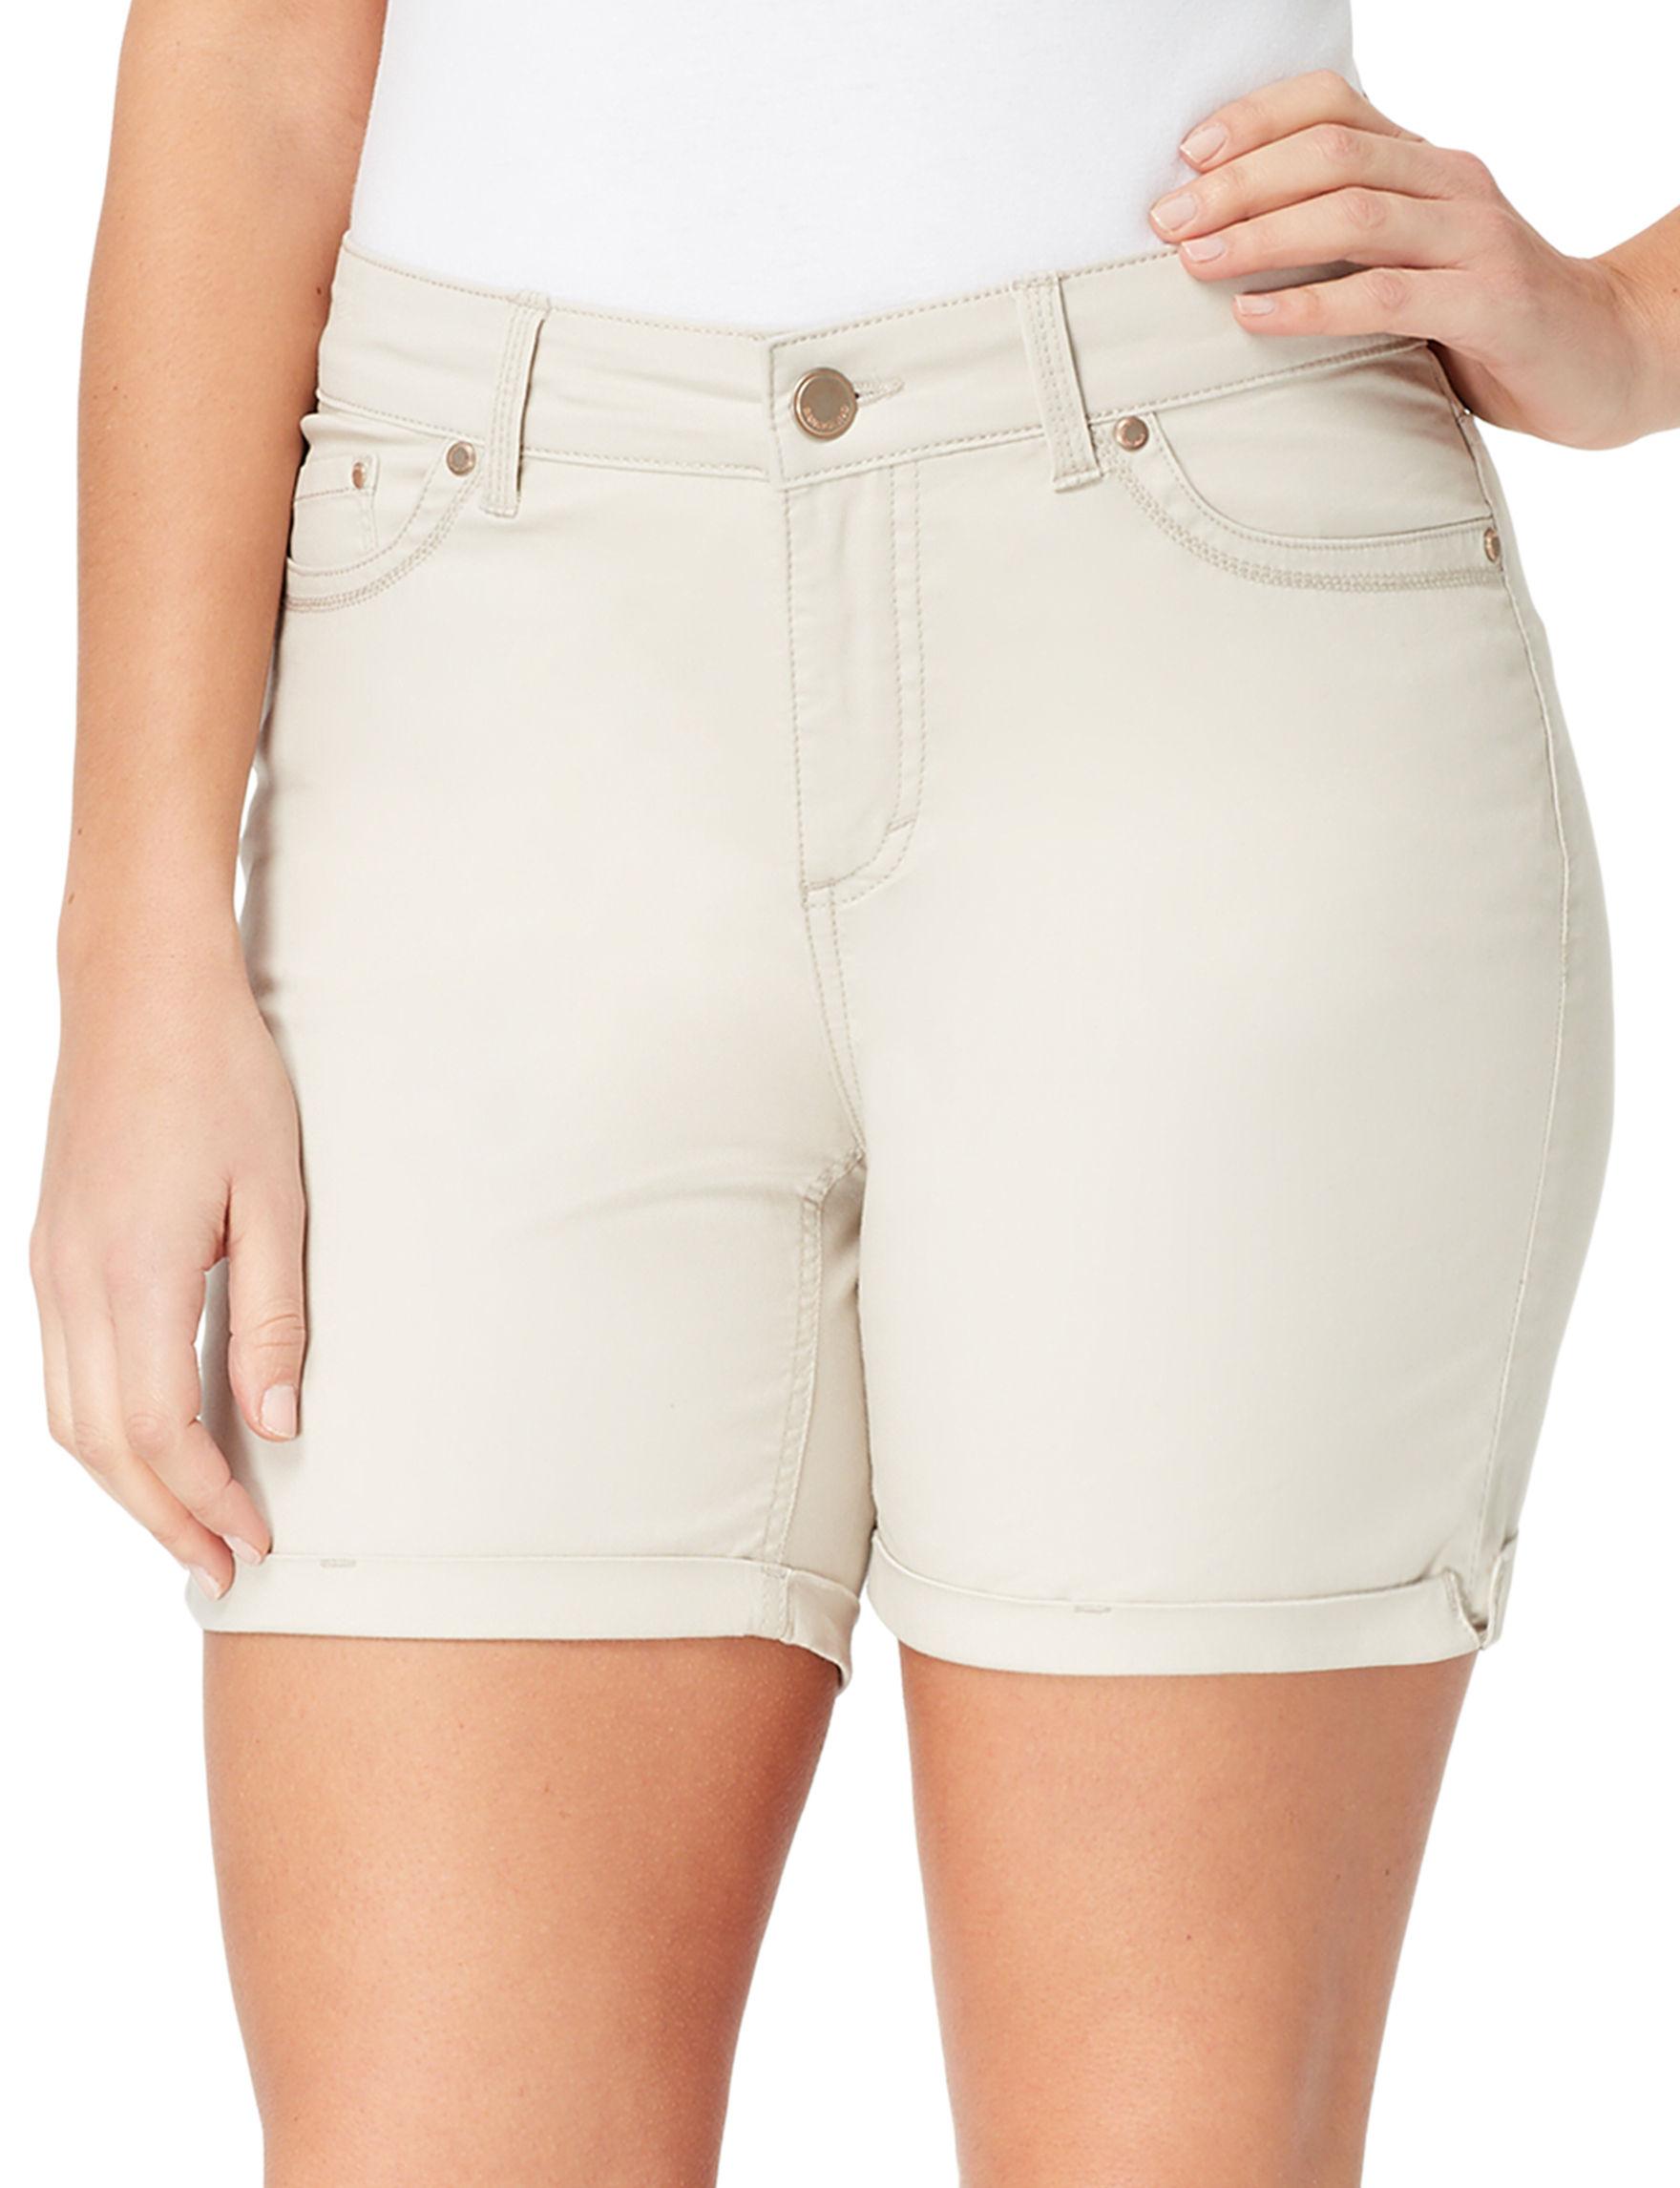 Bandolino Cream Denim Shorts